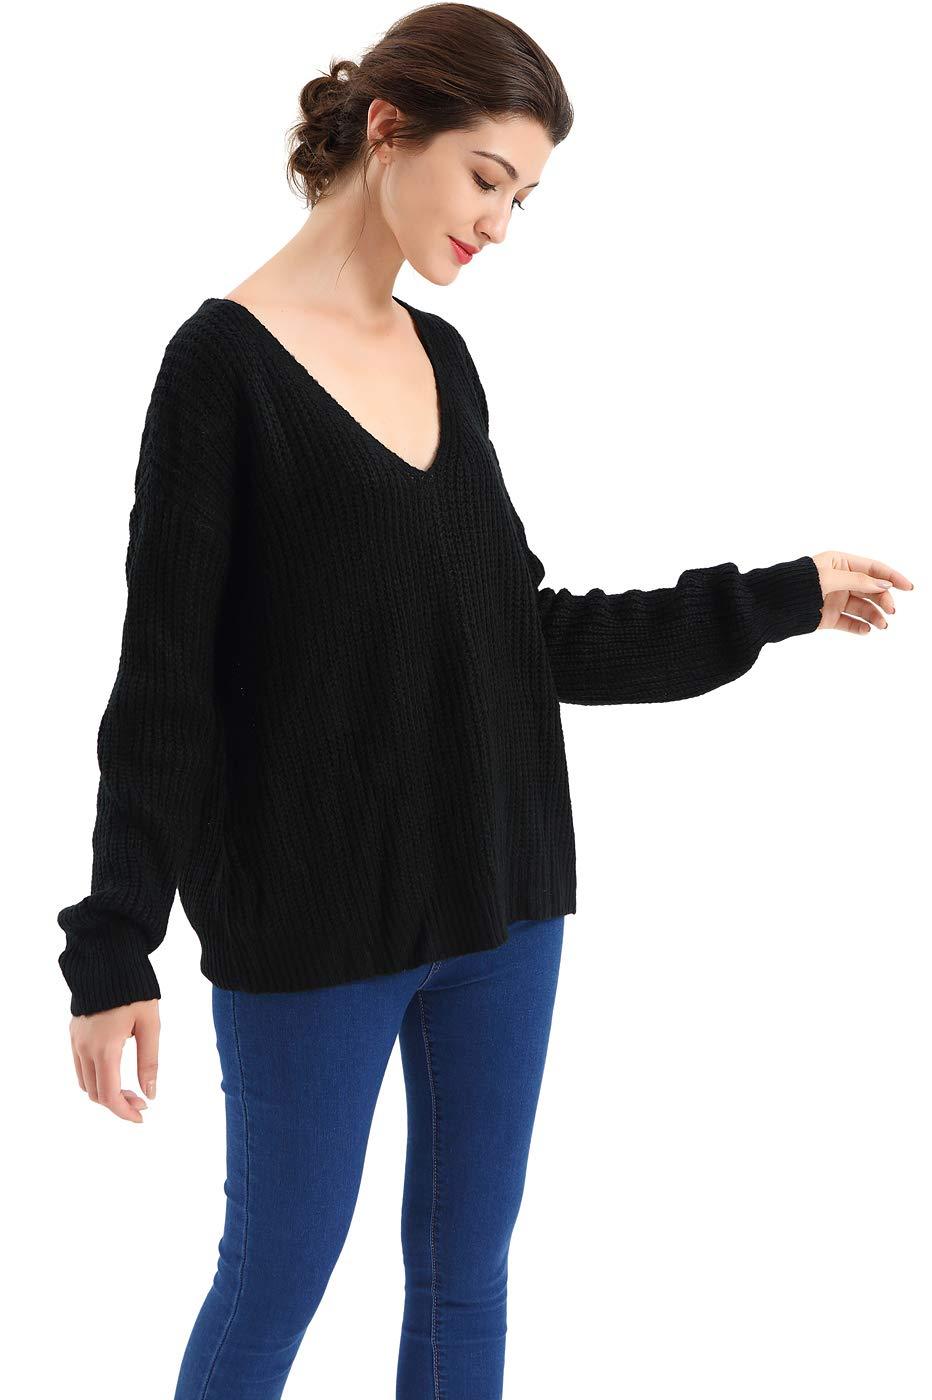 BodiLove Women's Dolman Sleeve Scoop Neck Ribbed Knit Sweater Black XL(DM18-888)